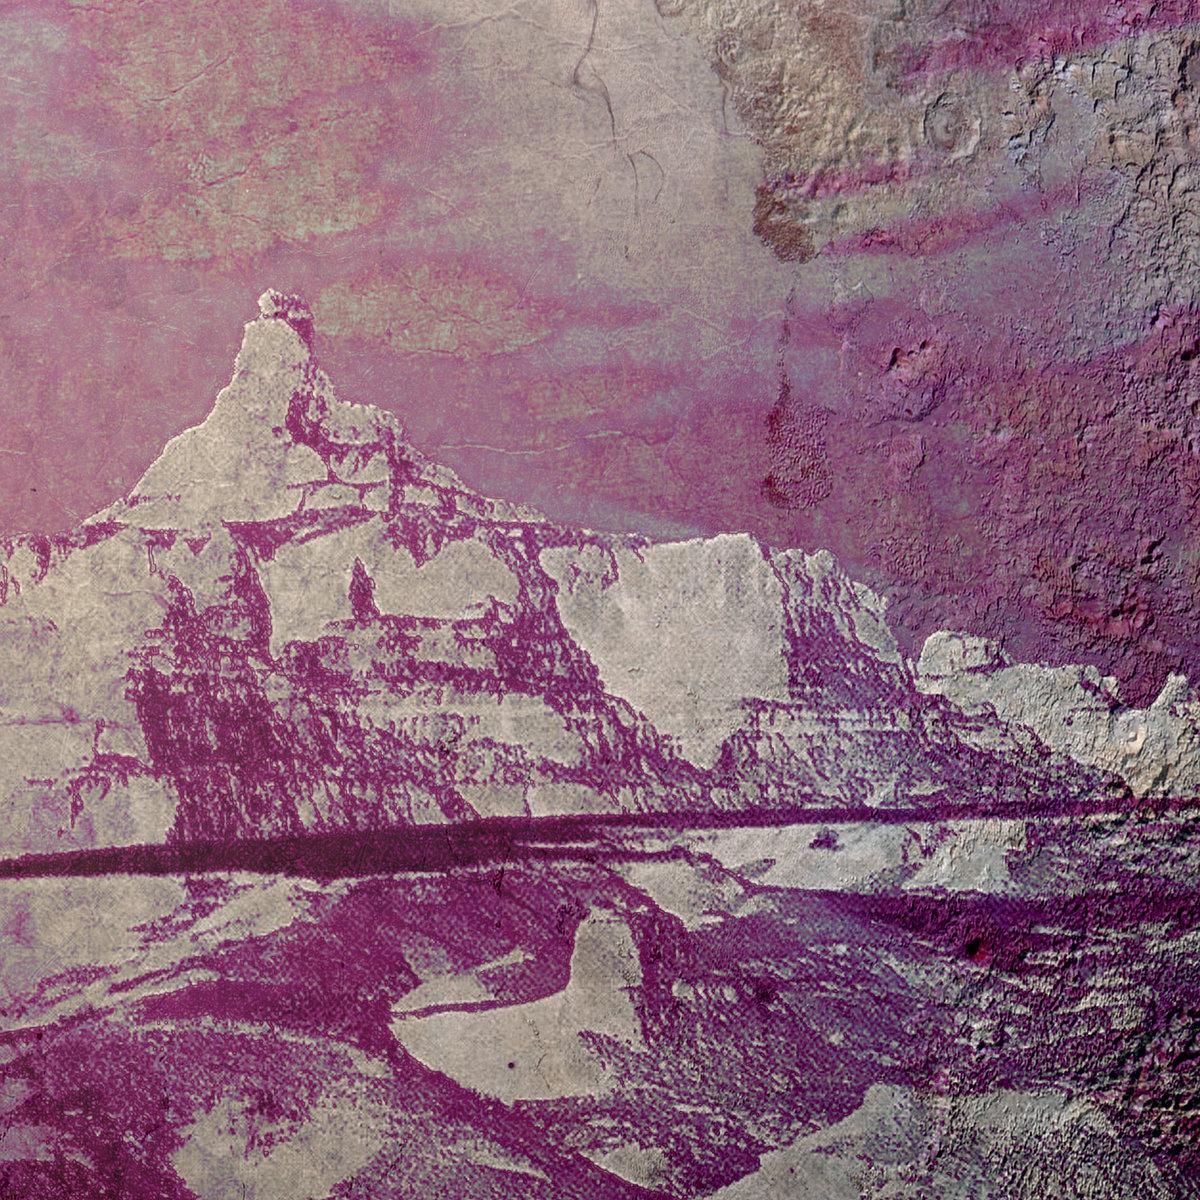 Astral Crazy Horse | The Eagle Stone Collective